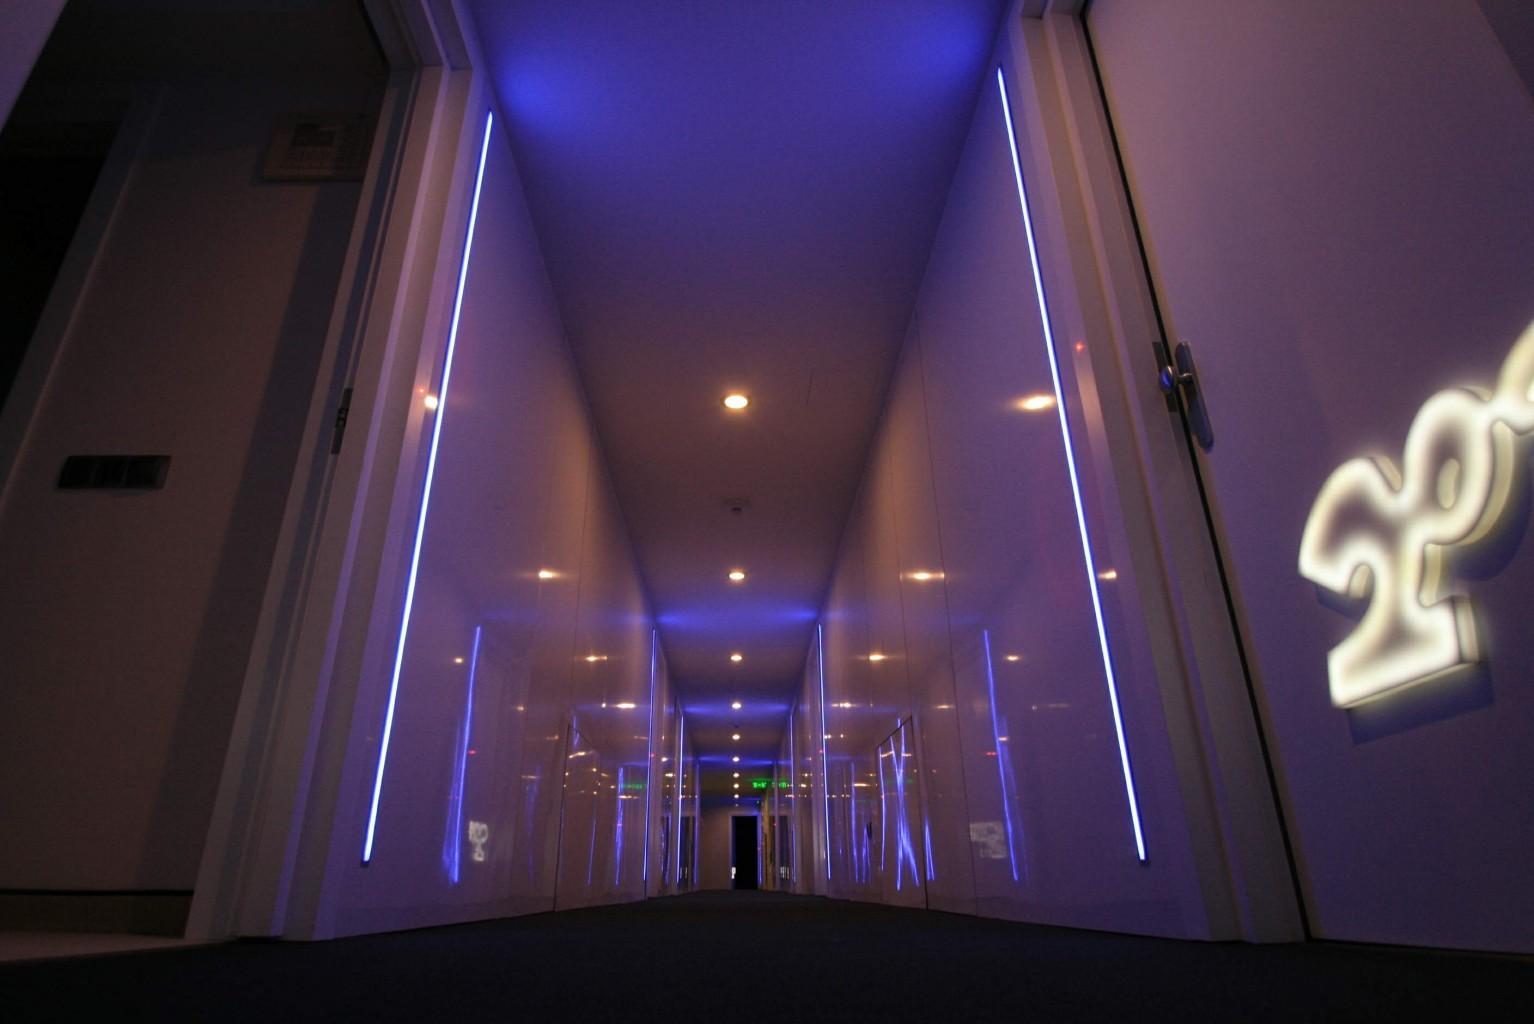 hol schimb culoare placare hpl 3mm alb lucios reflexiv usi cu numere plexiglas iluminate